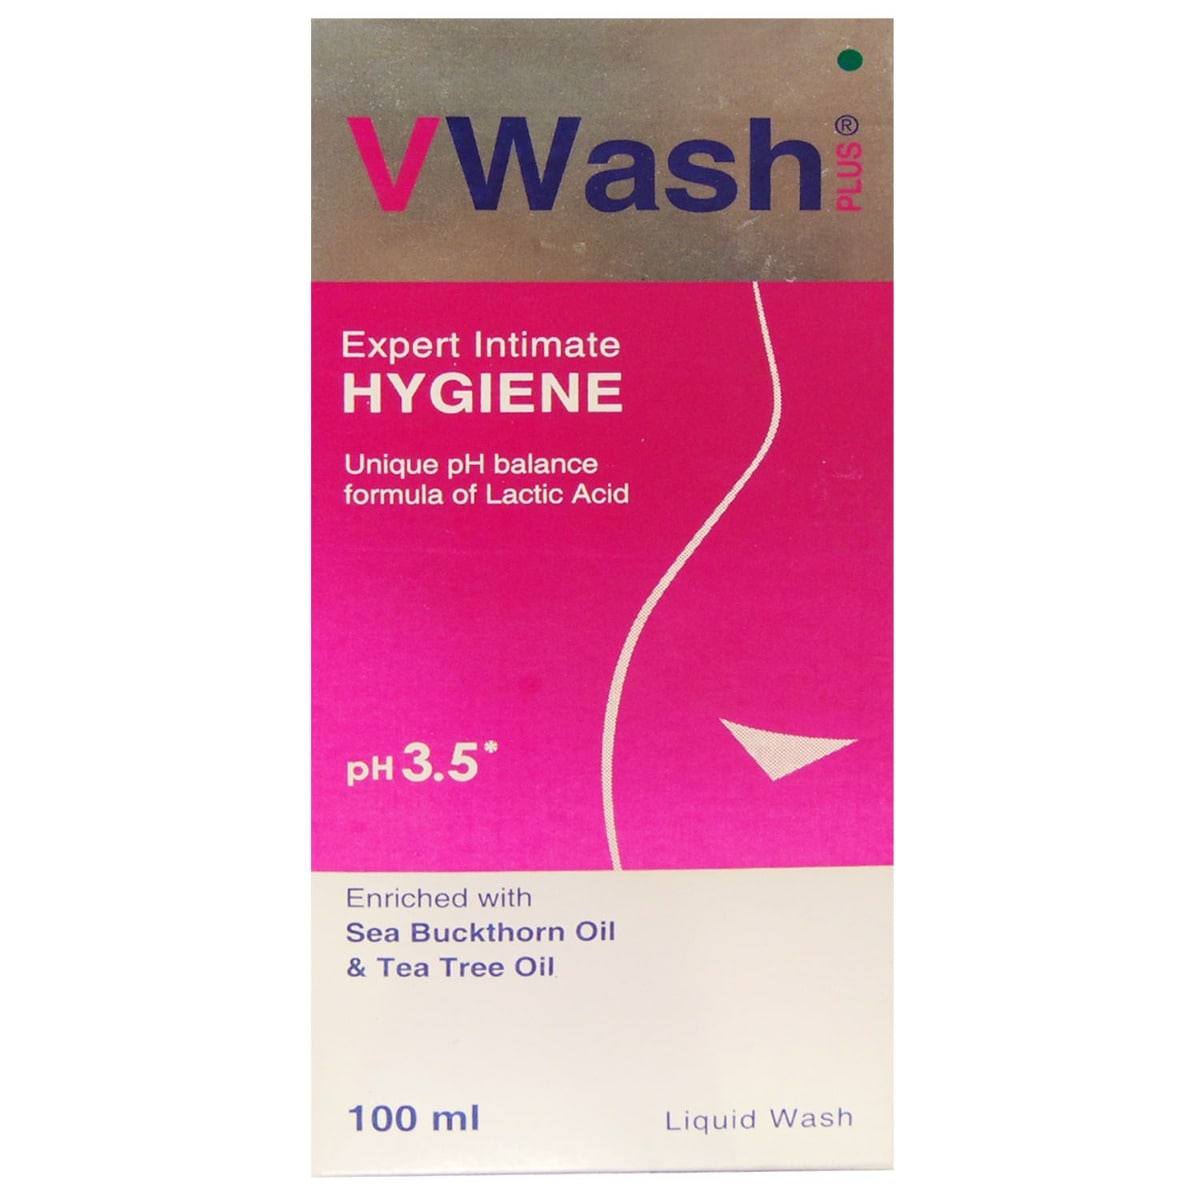 VWash Plus Expert Intimate Hygiene Wash, 100 ml